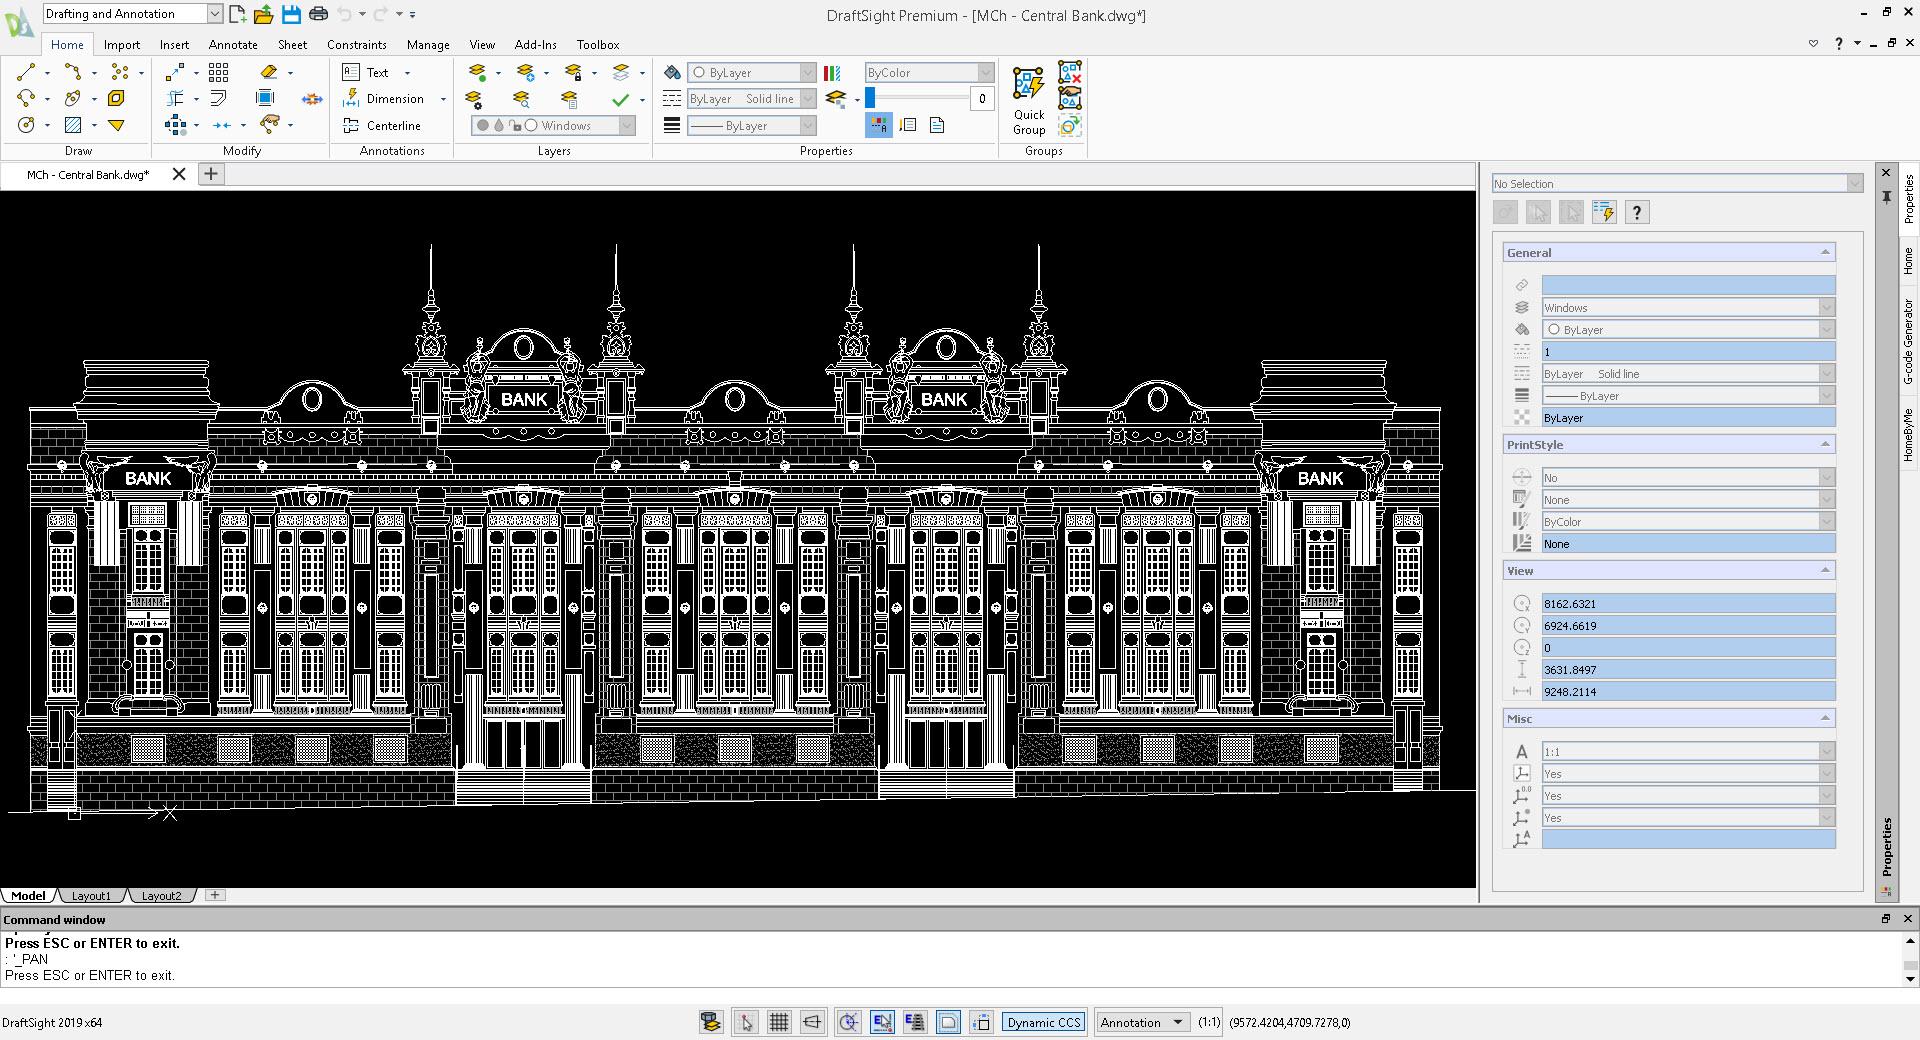 Draftsight : logiciel de DAO historique